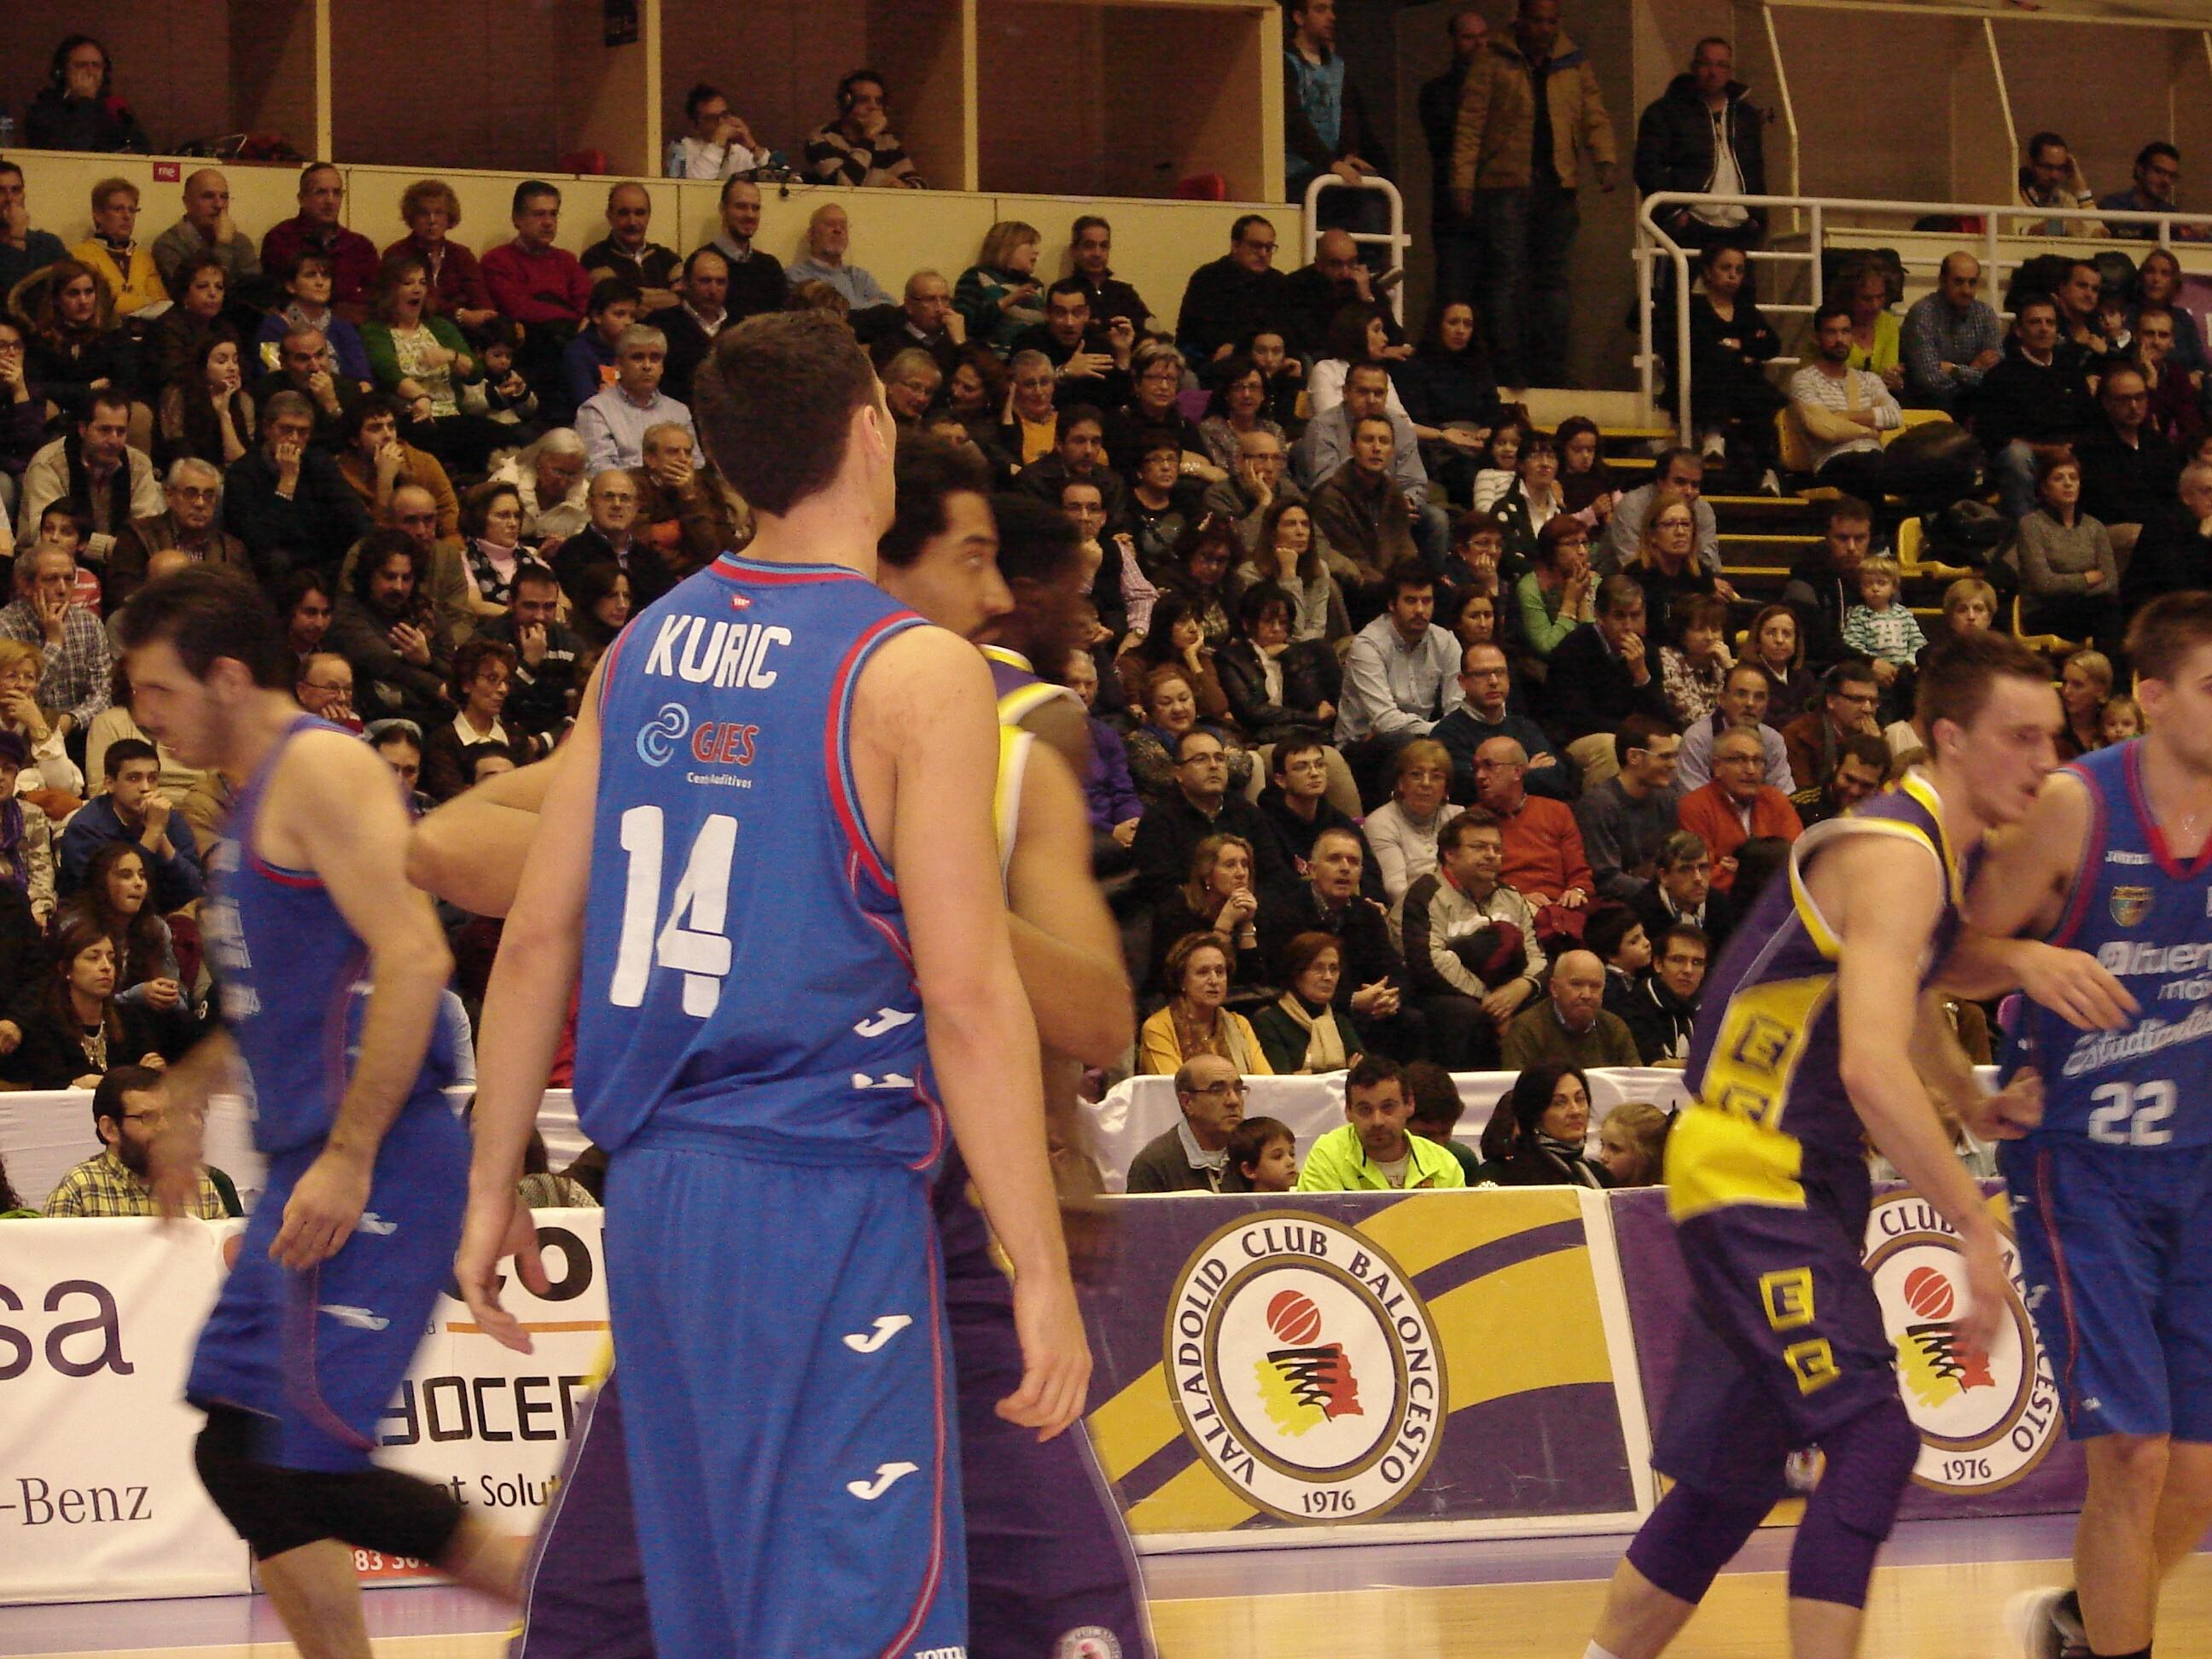 Kuric defendido por Suka-Umu (Foto: Jose Navas)